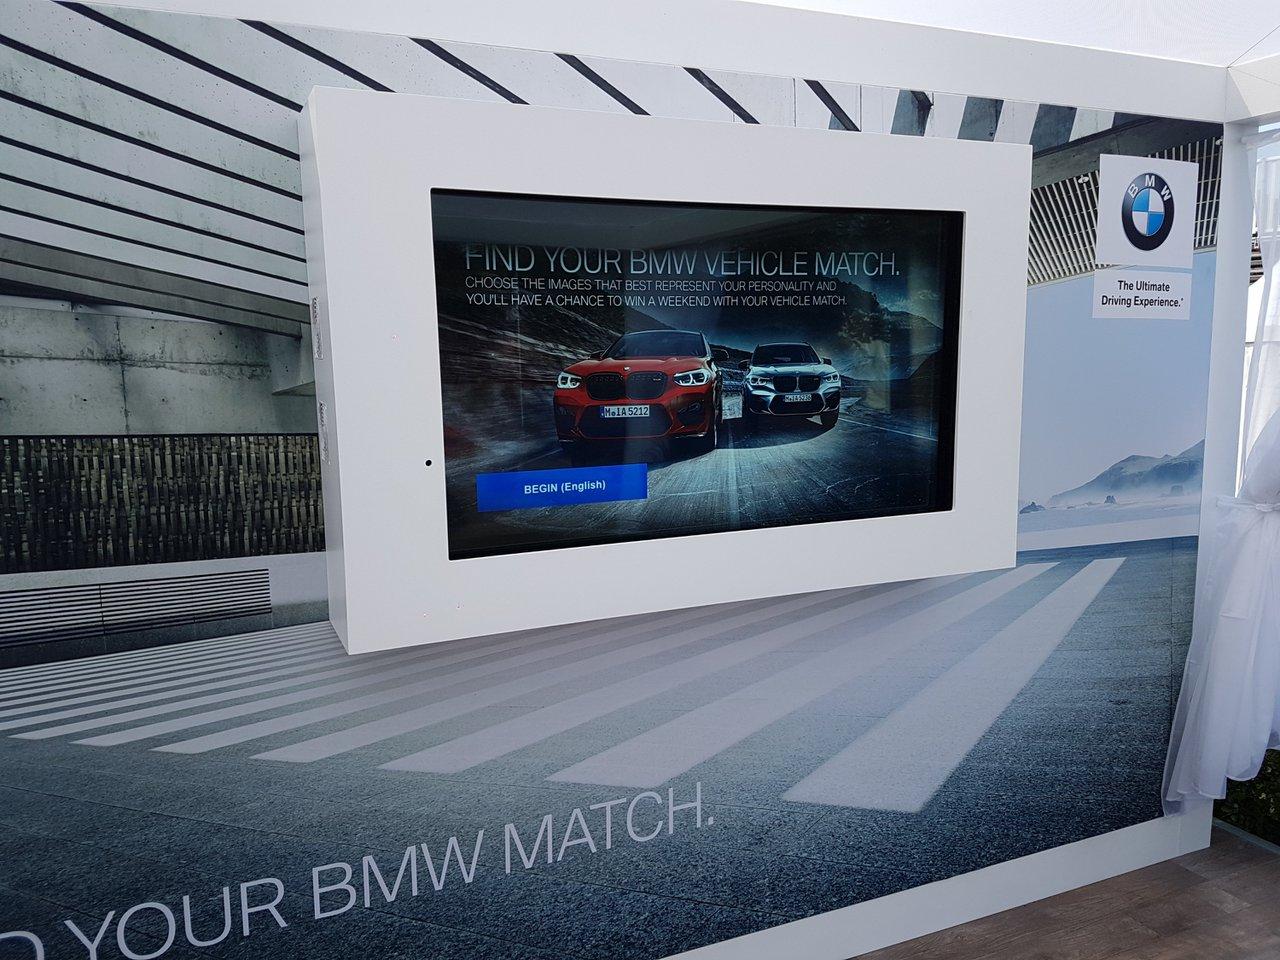 BMW Matchmaker Digital Interactive Game photo 20190801_100605.jpg